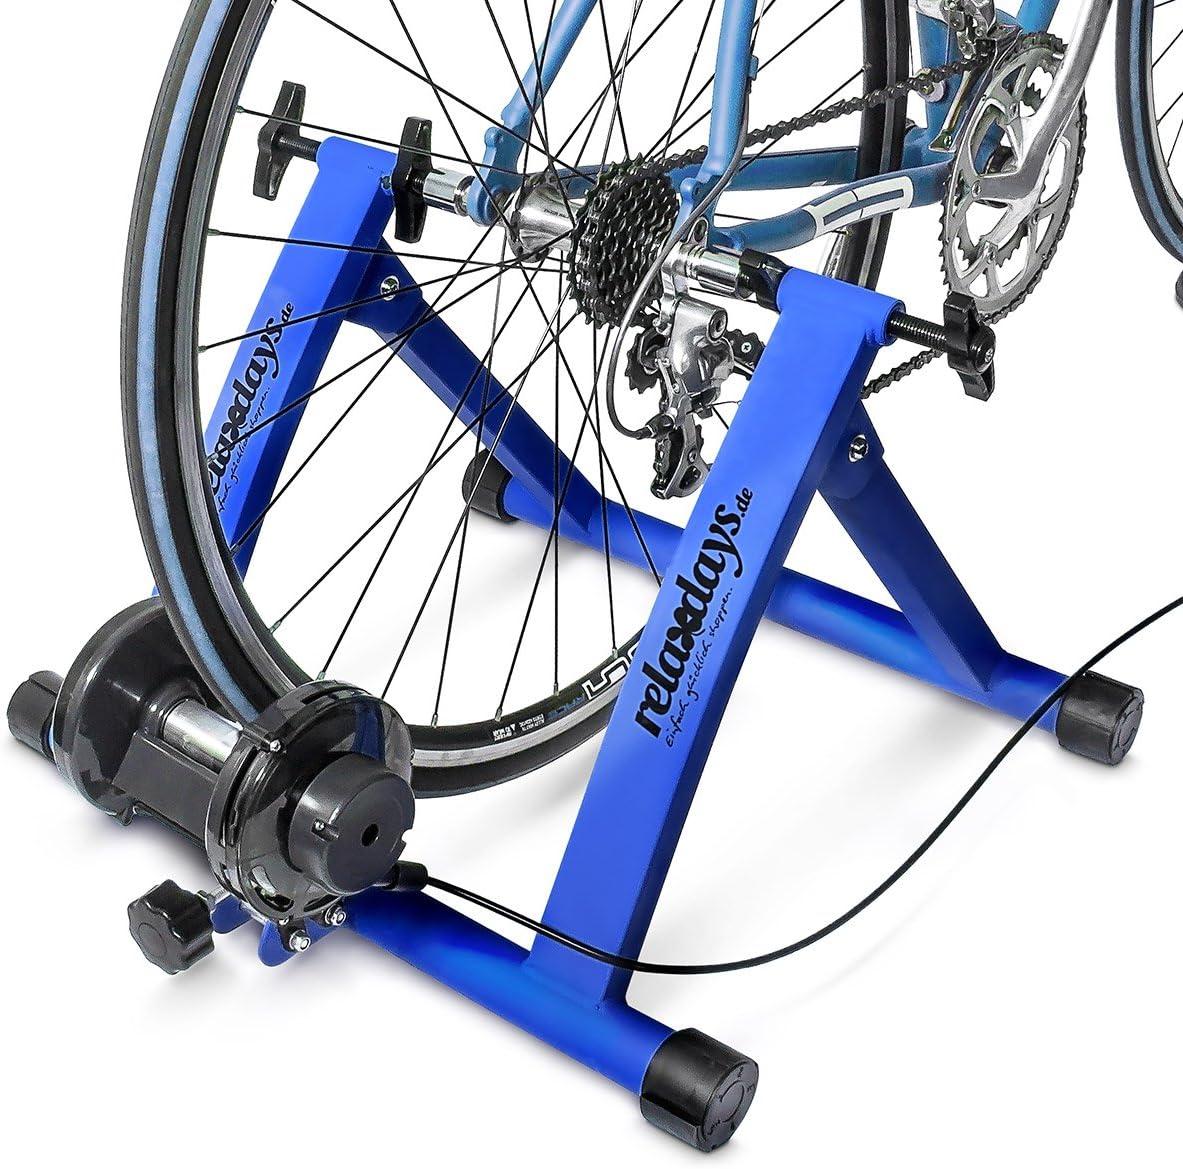 Relaxdays Heimtrainer Fahrrad Rollen, Convierte Bicicleta común a estática, Mide: 54 x 46 x 20 cm, Azul, Unisex Adulto